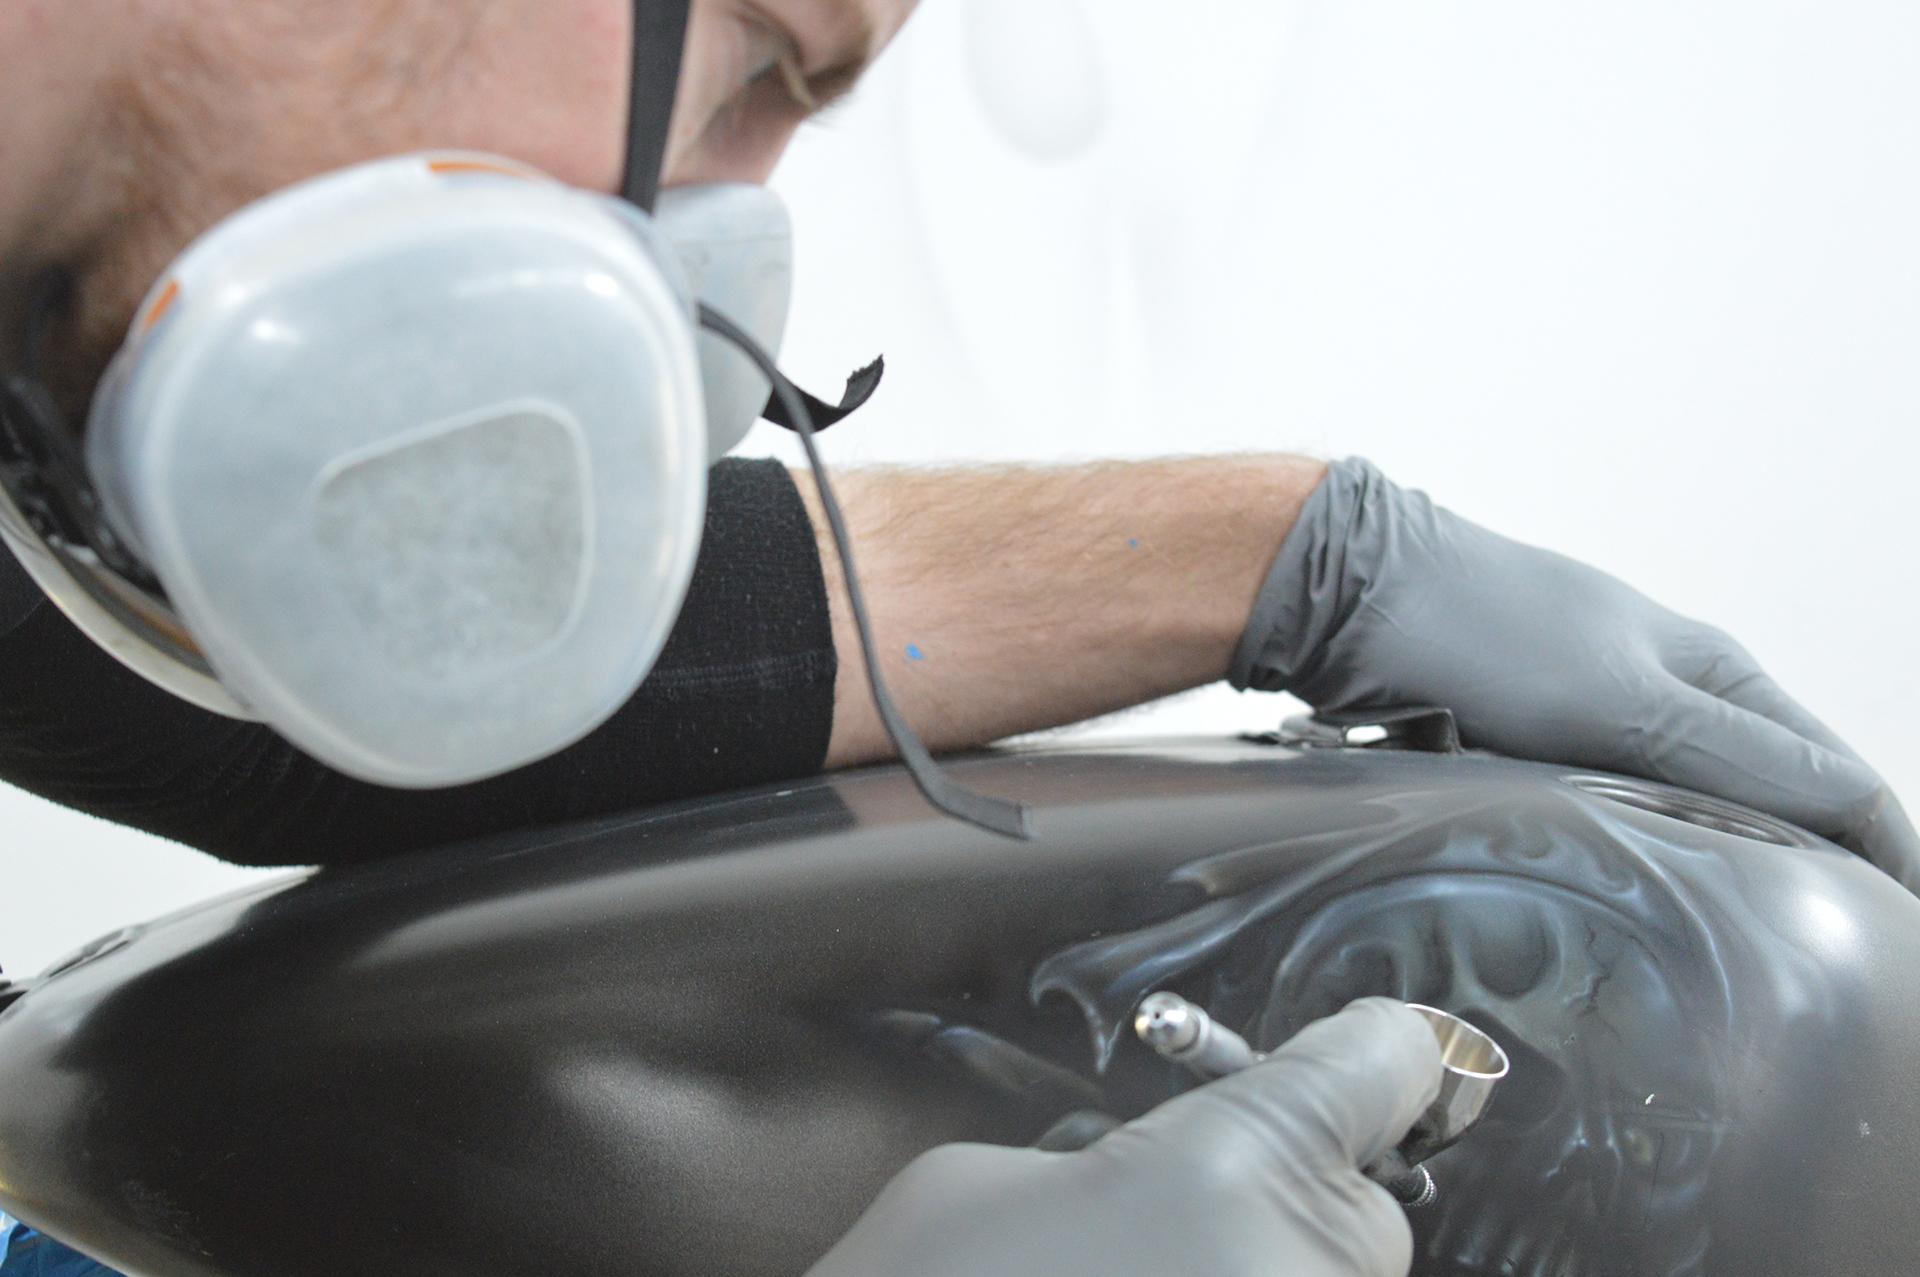 DAM Designs airbrush specialist